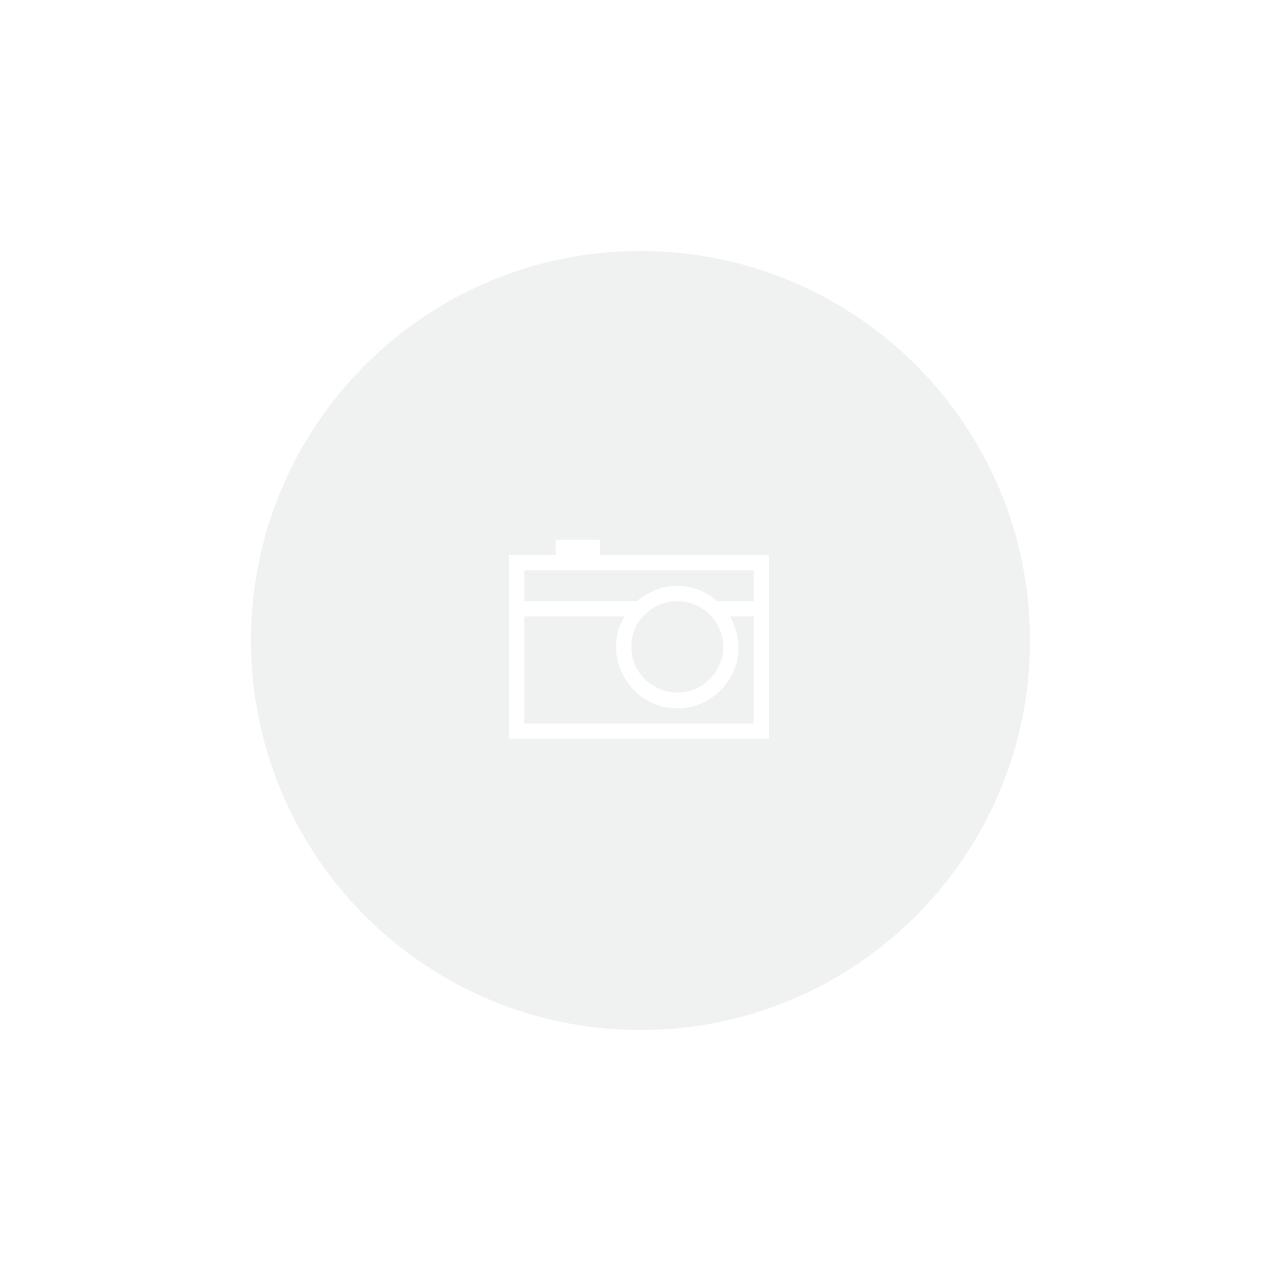 Panela com Cabo Inox 16cm 1,50 Litros Allegra Tramontina